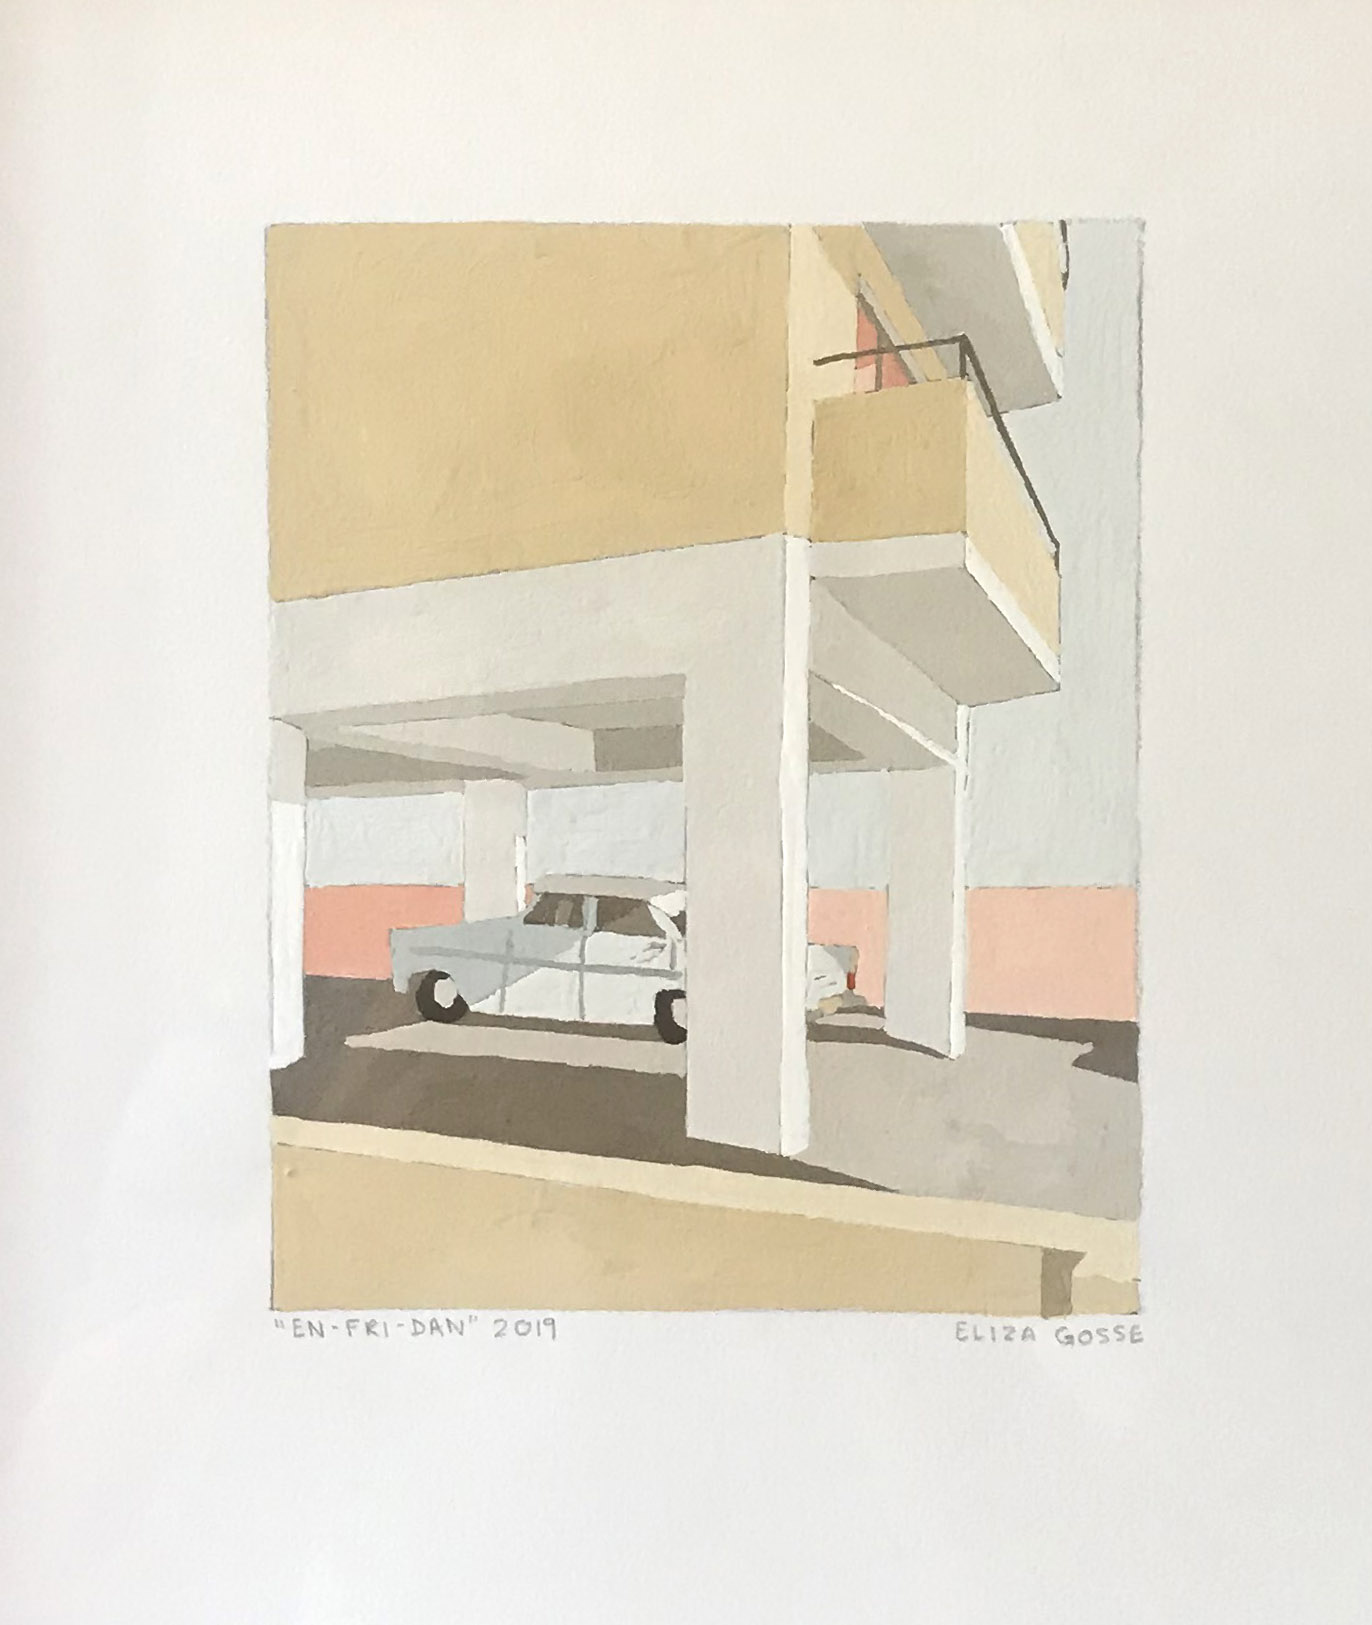 ELIZA GOSSE  En-Fri-Dan , 2019 gouache on paper 15 x 12 cm